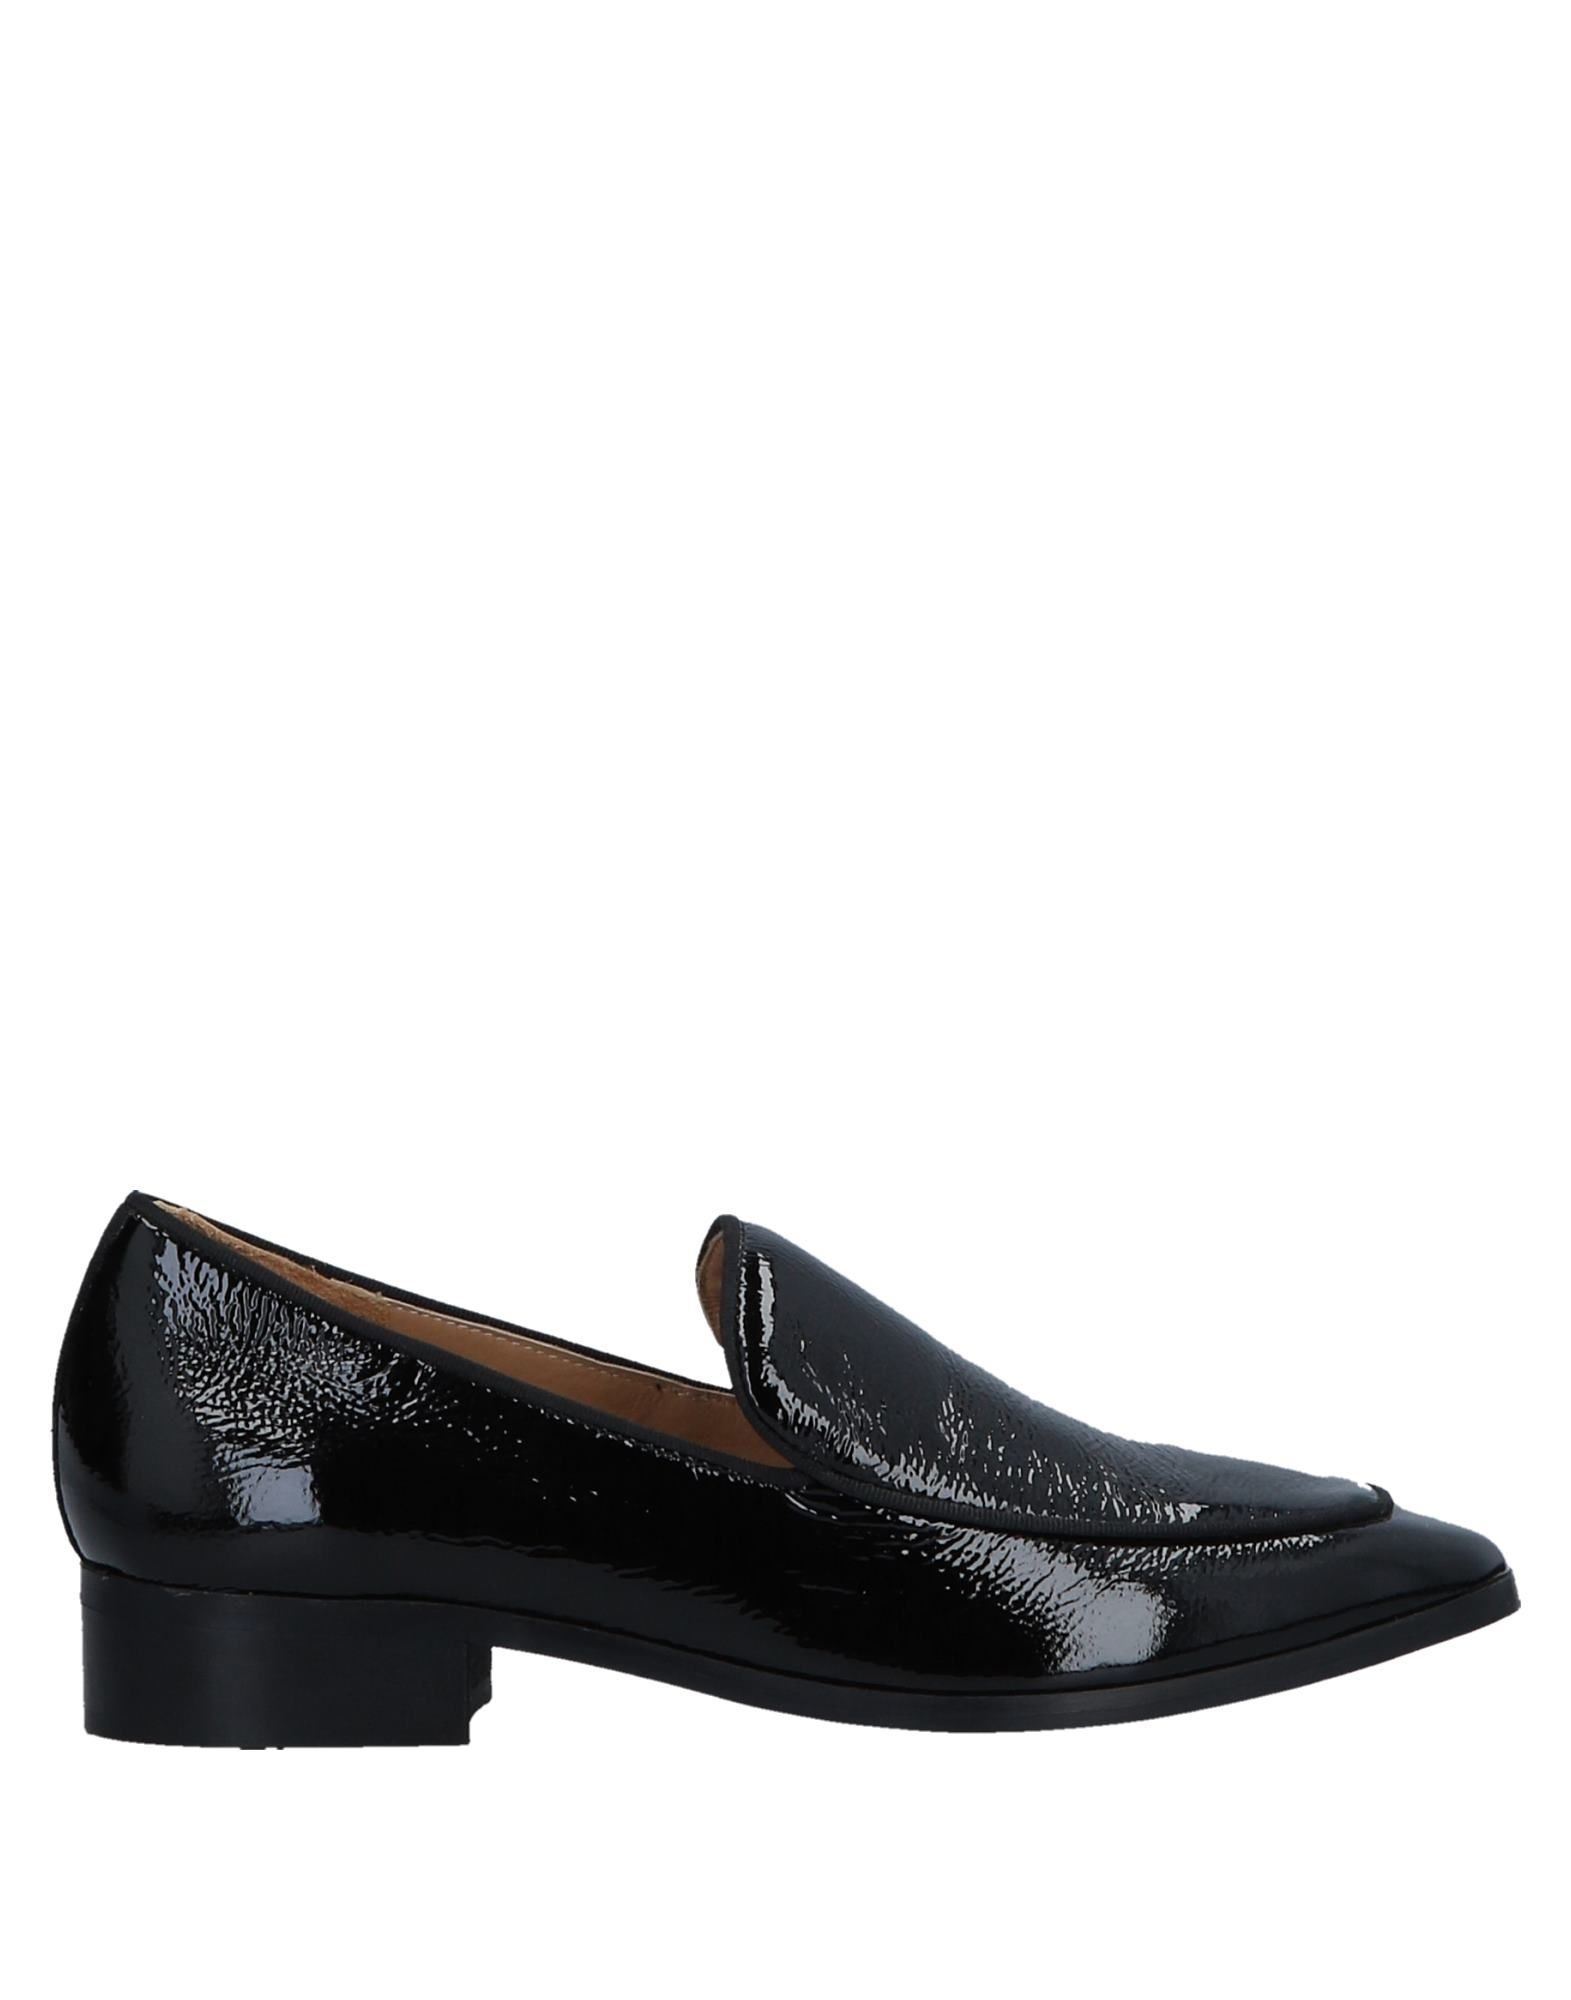 Carmens Loafers - Canada Women Carmens Loafers online on  Canada - - 11511890JO 795c49